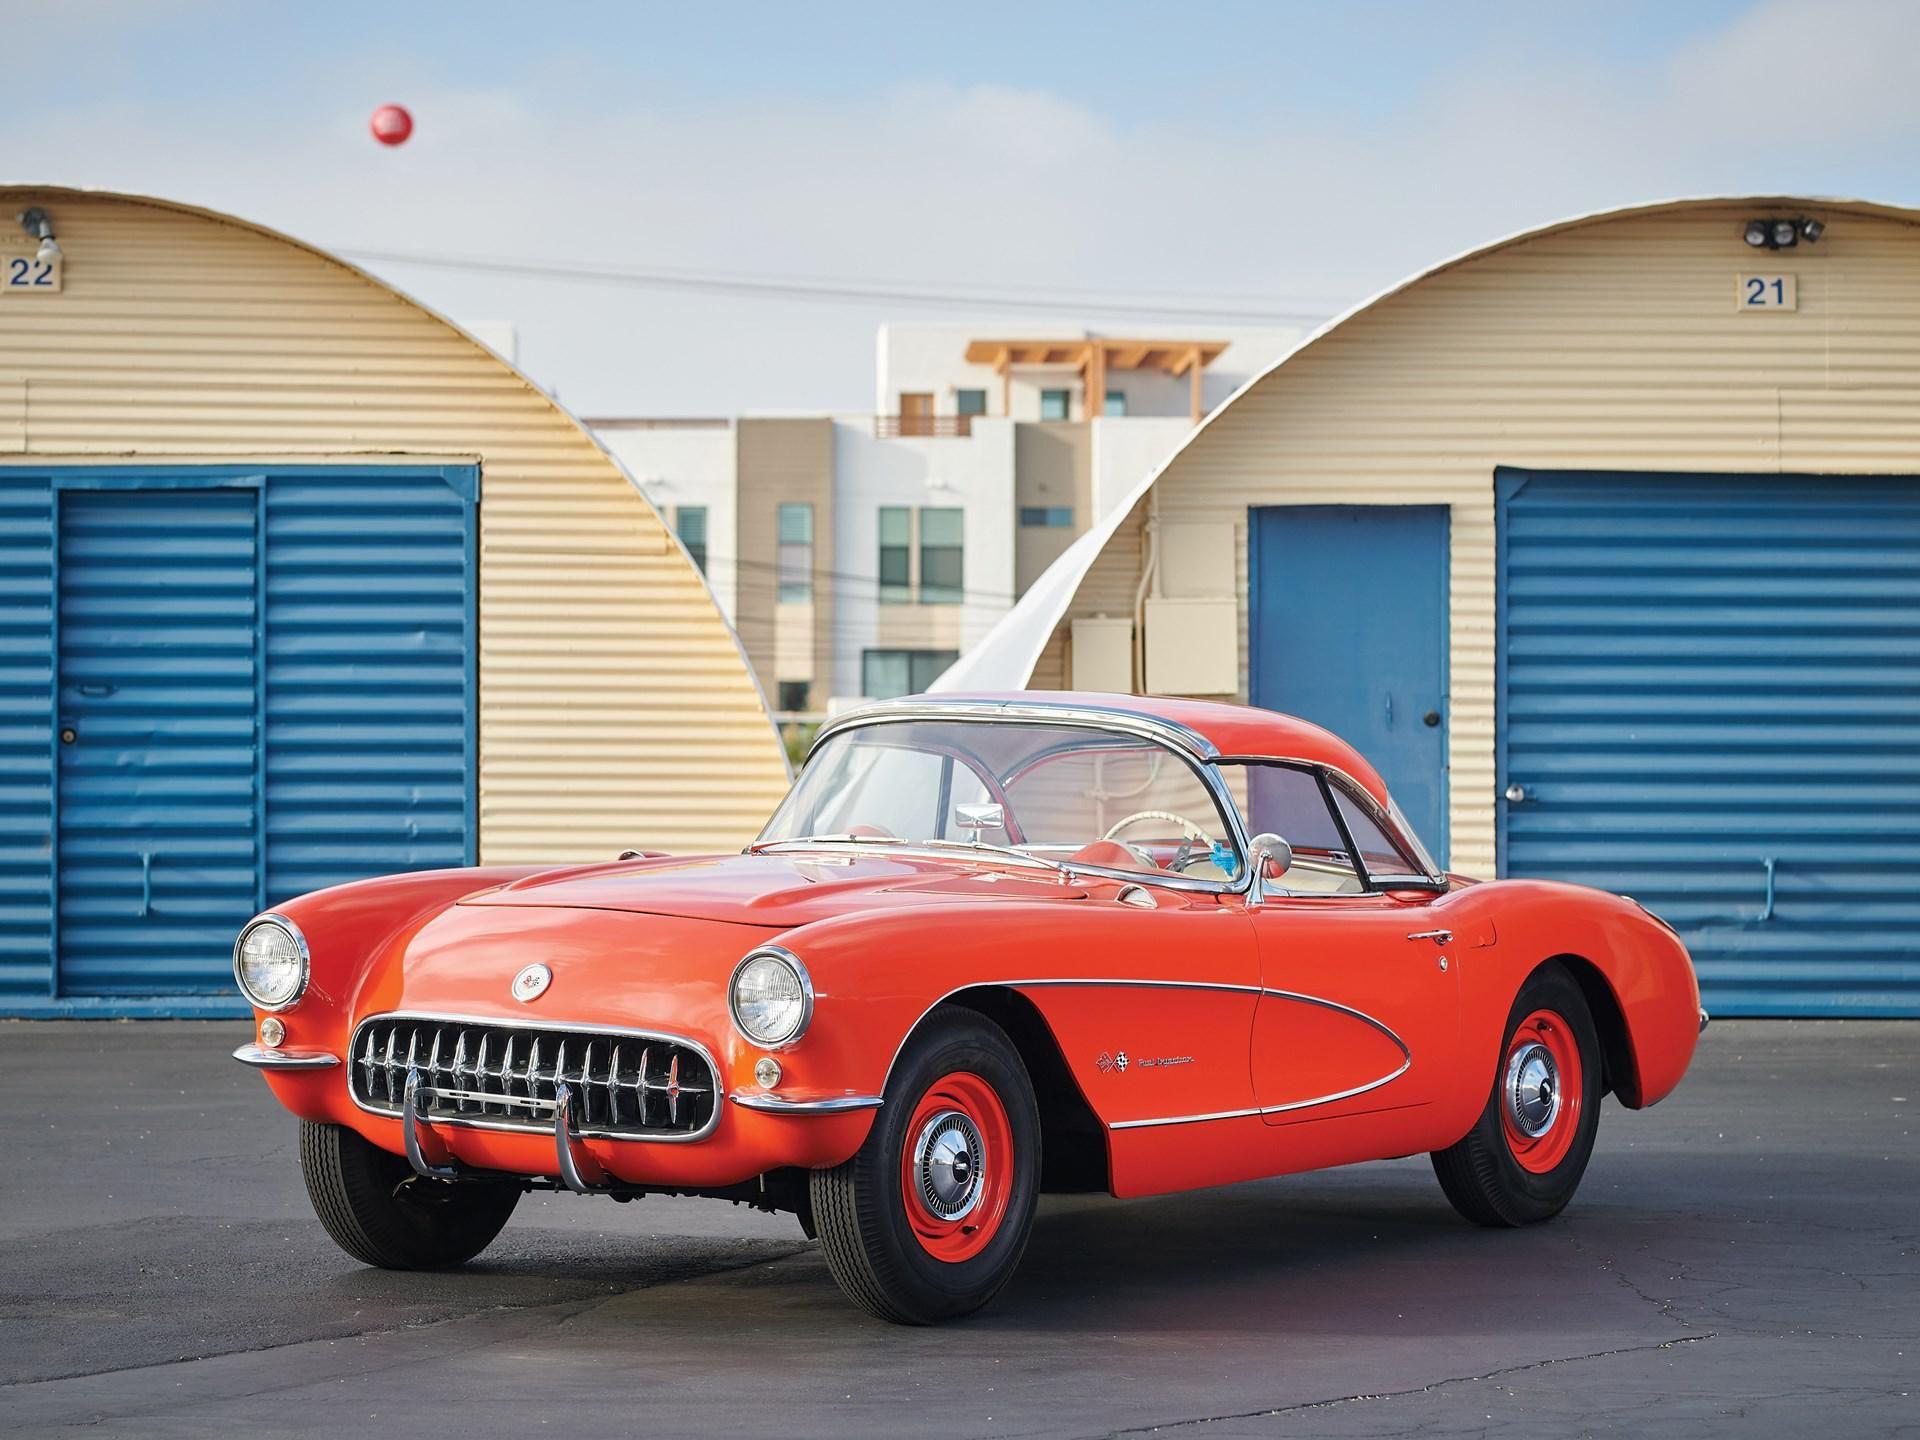 1957 Chevrolet Corvette 'Big Brake & Airbox'